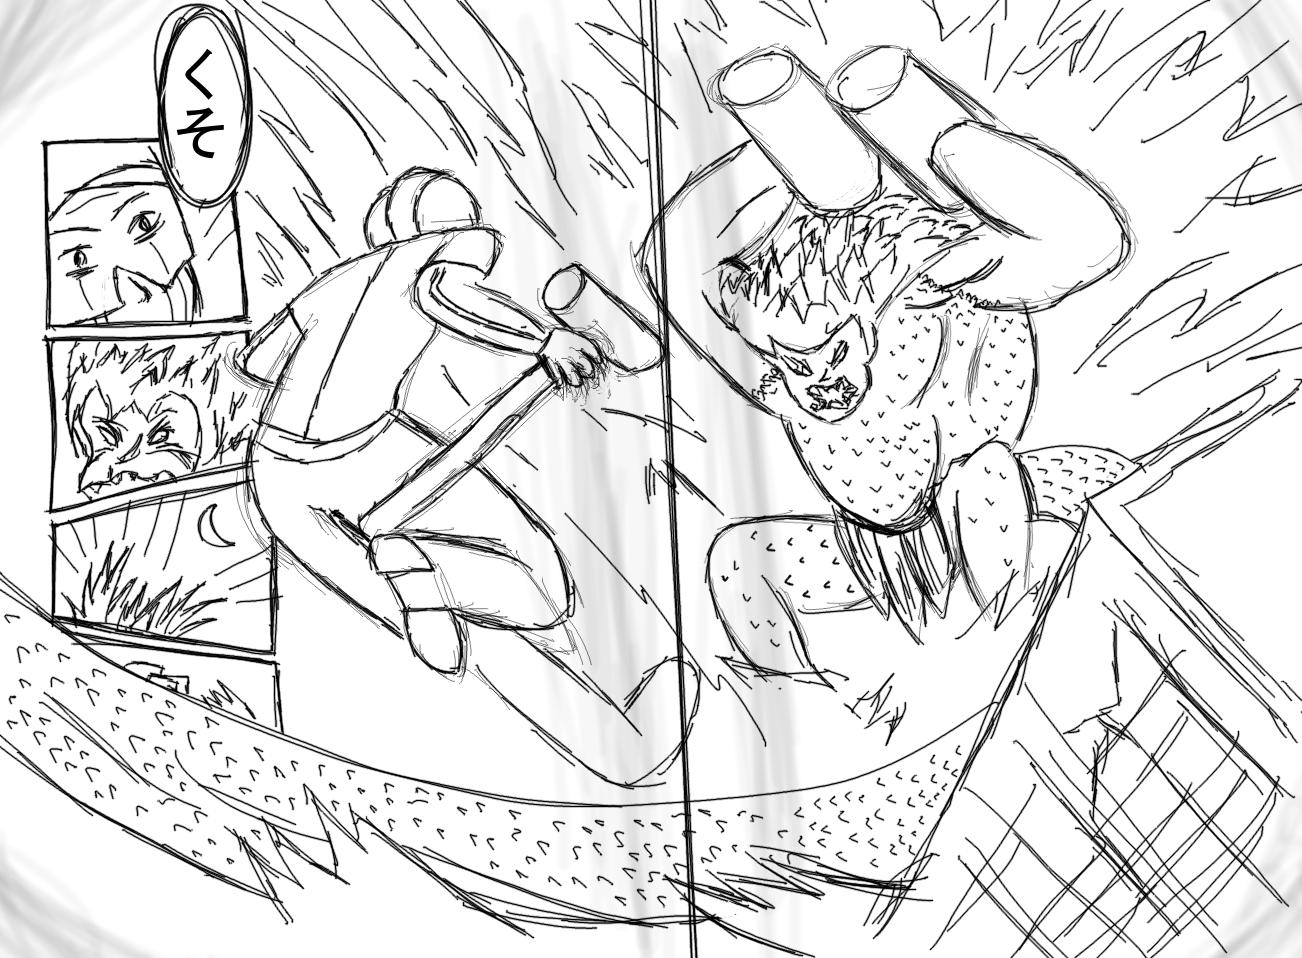 Kouzuichi Wakaman: Croquet Superhero by The-Author-M